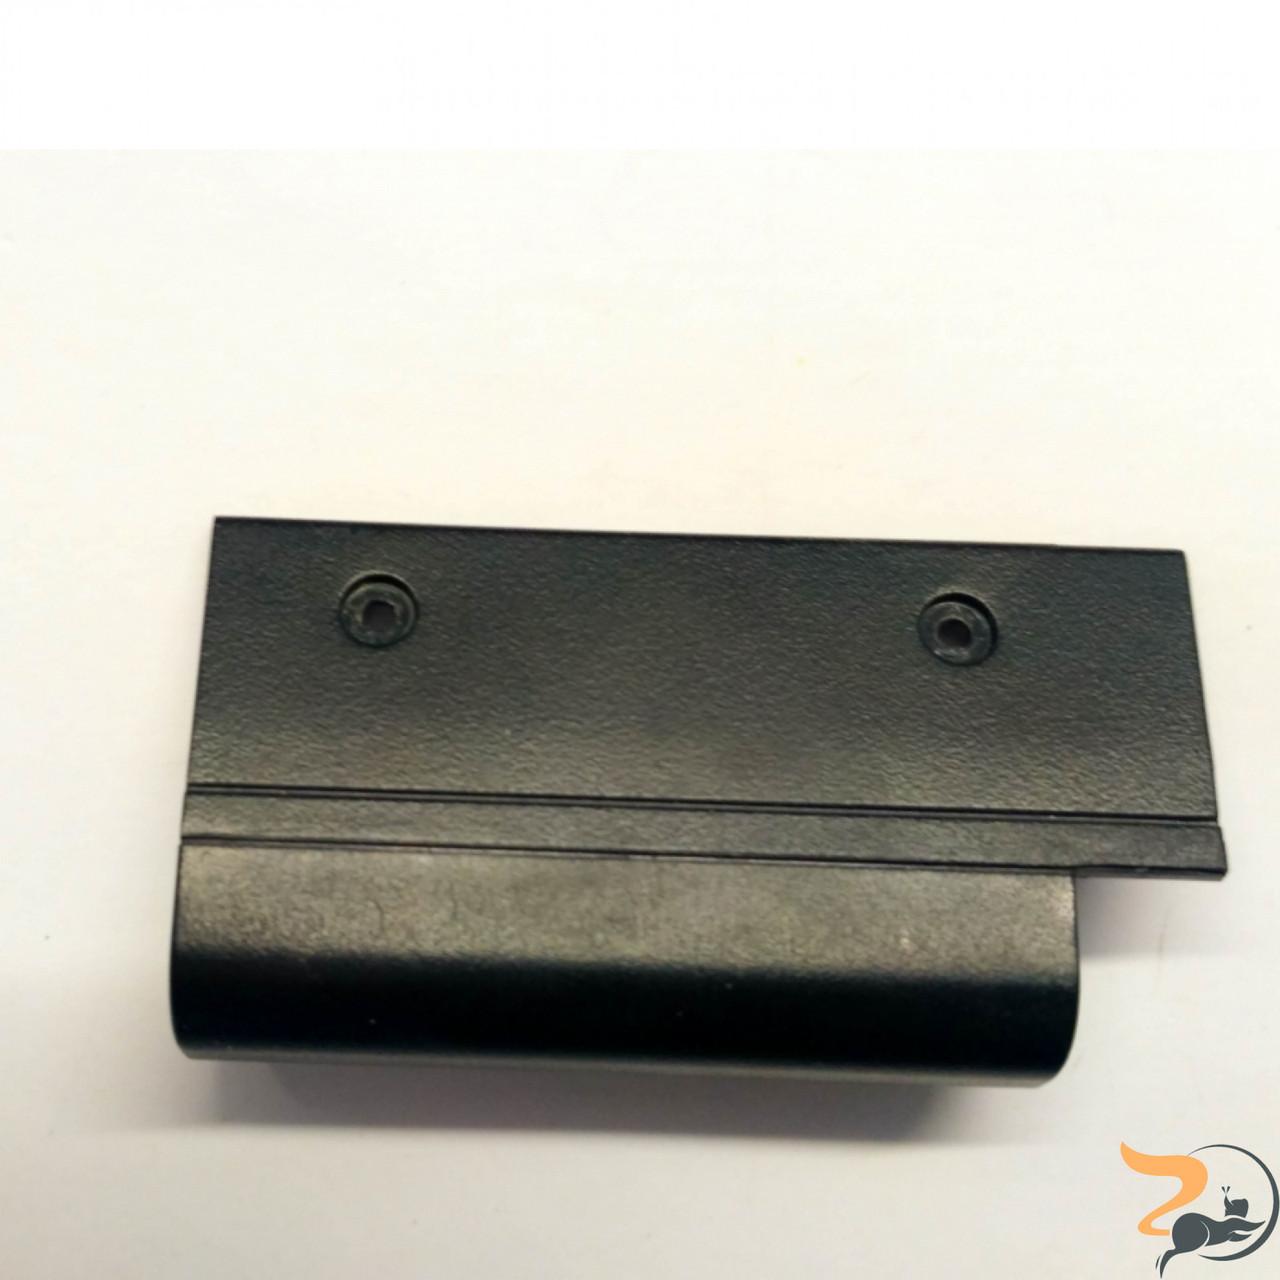 Сервісна кришка для ноутбука Asus A6000, 13-NCG10P130-1, Б/В. Без пошкоджень.